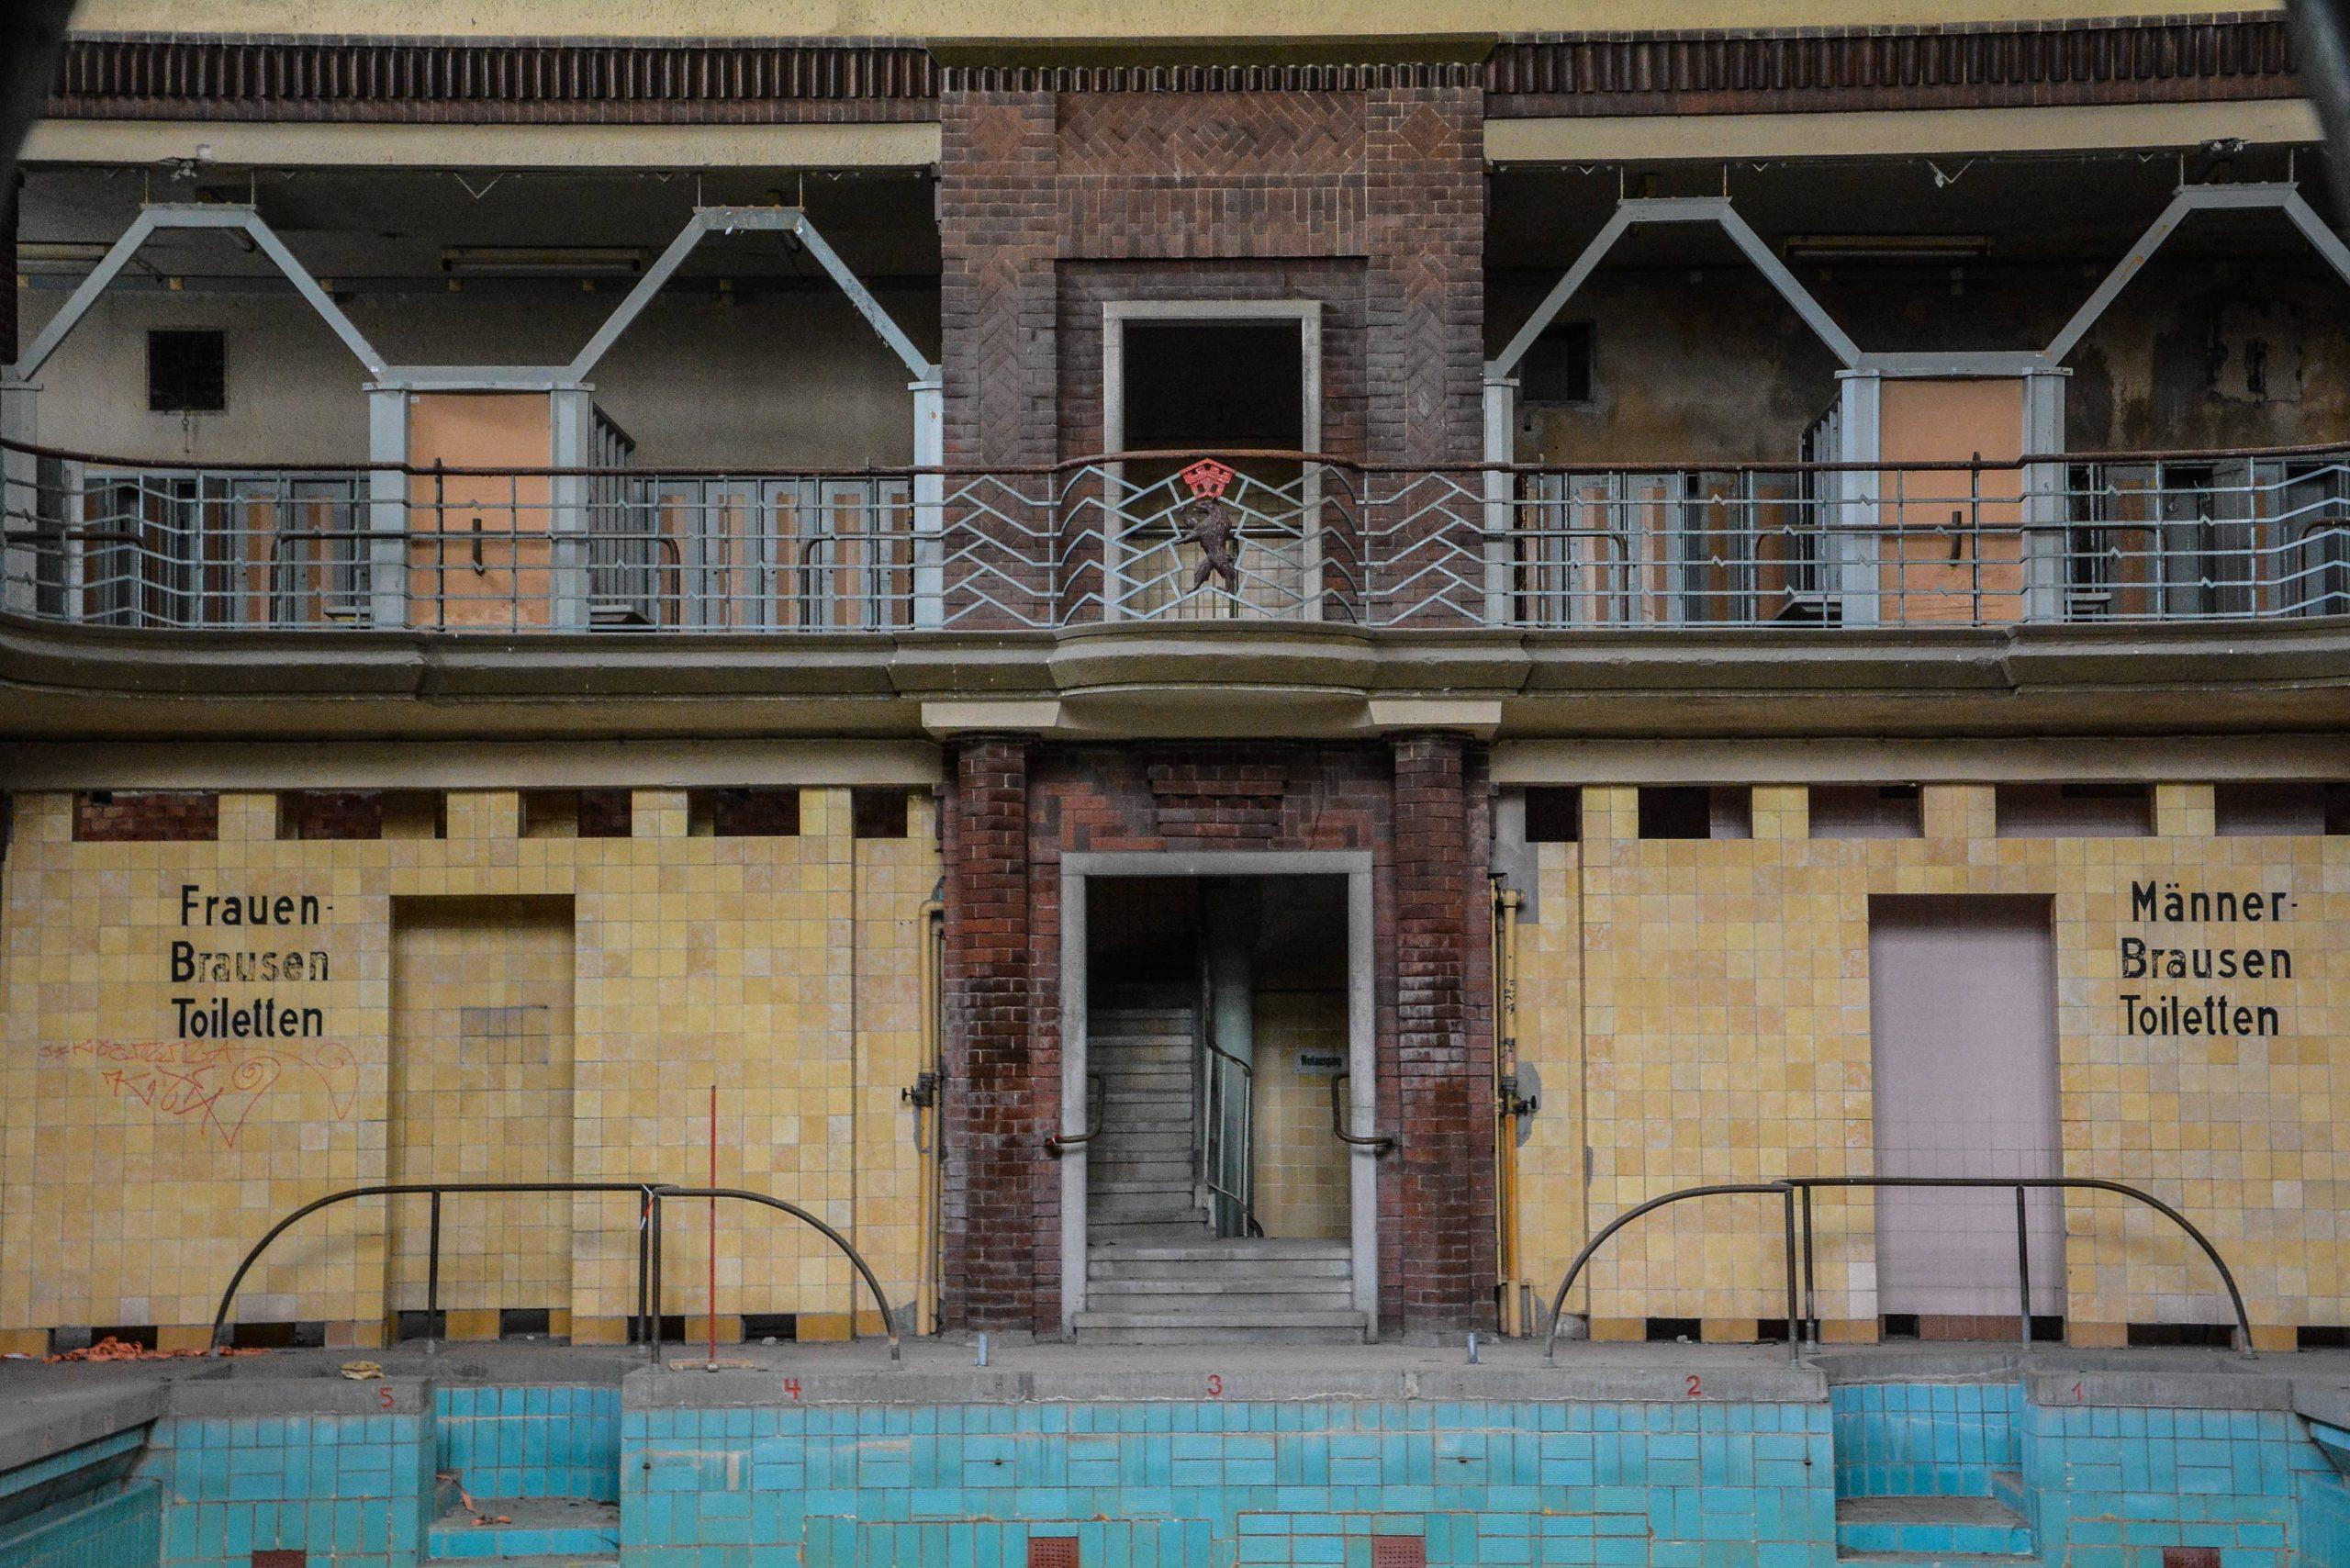 schwimmbad balkon stadtbad lichtenberg hubertusbad berlin abandoned pool urbex lost places